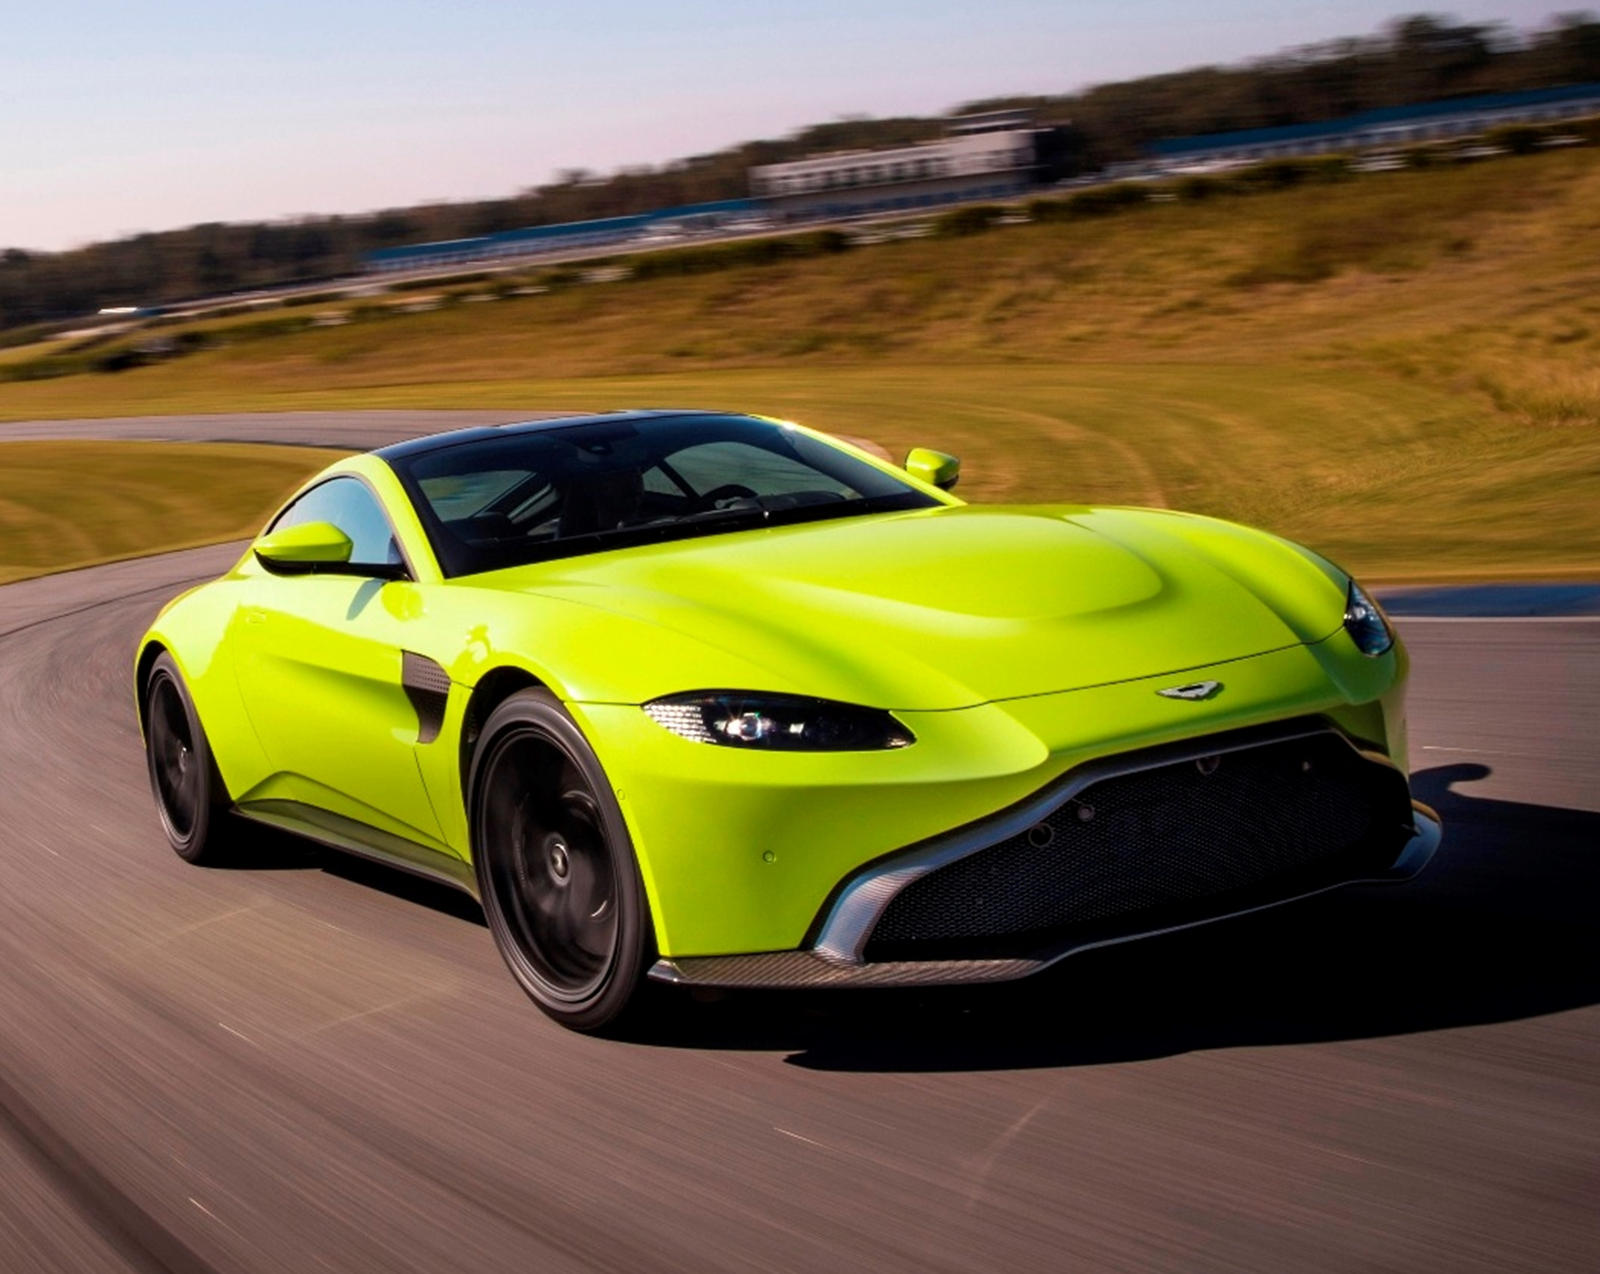 Aston Martin Responds To Canadian Billionaire Investor Report